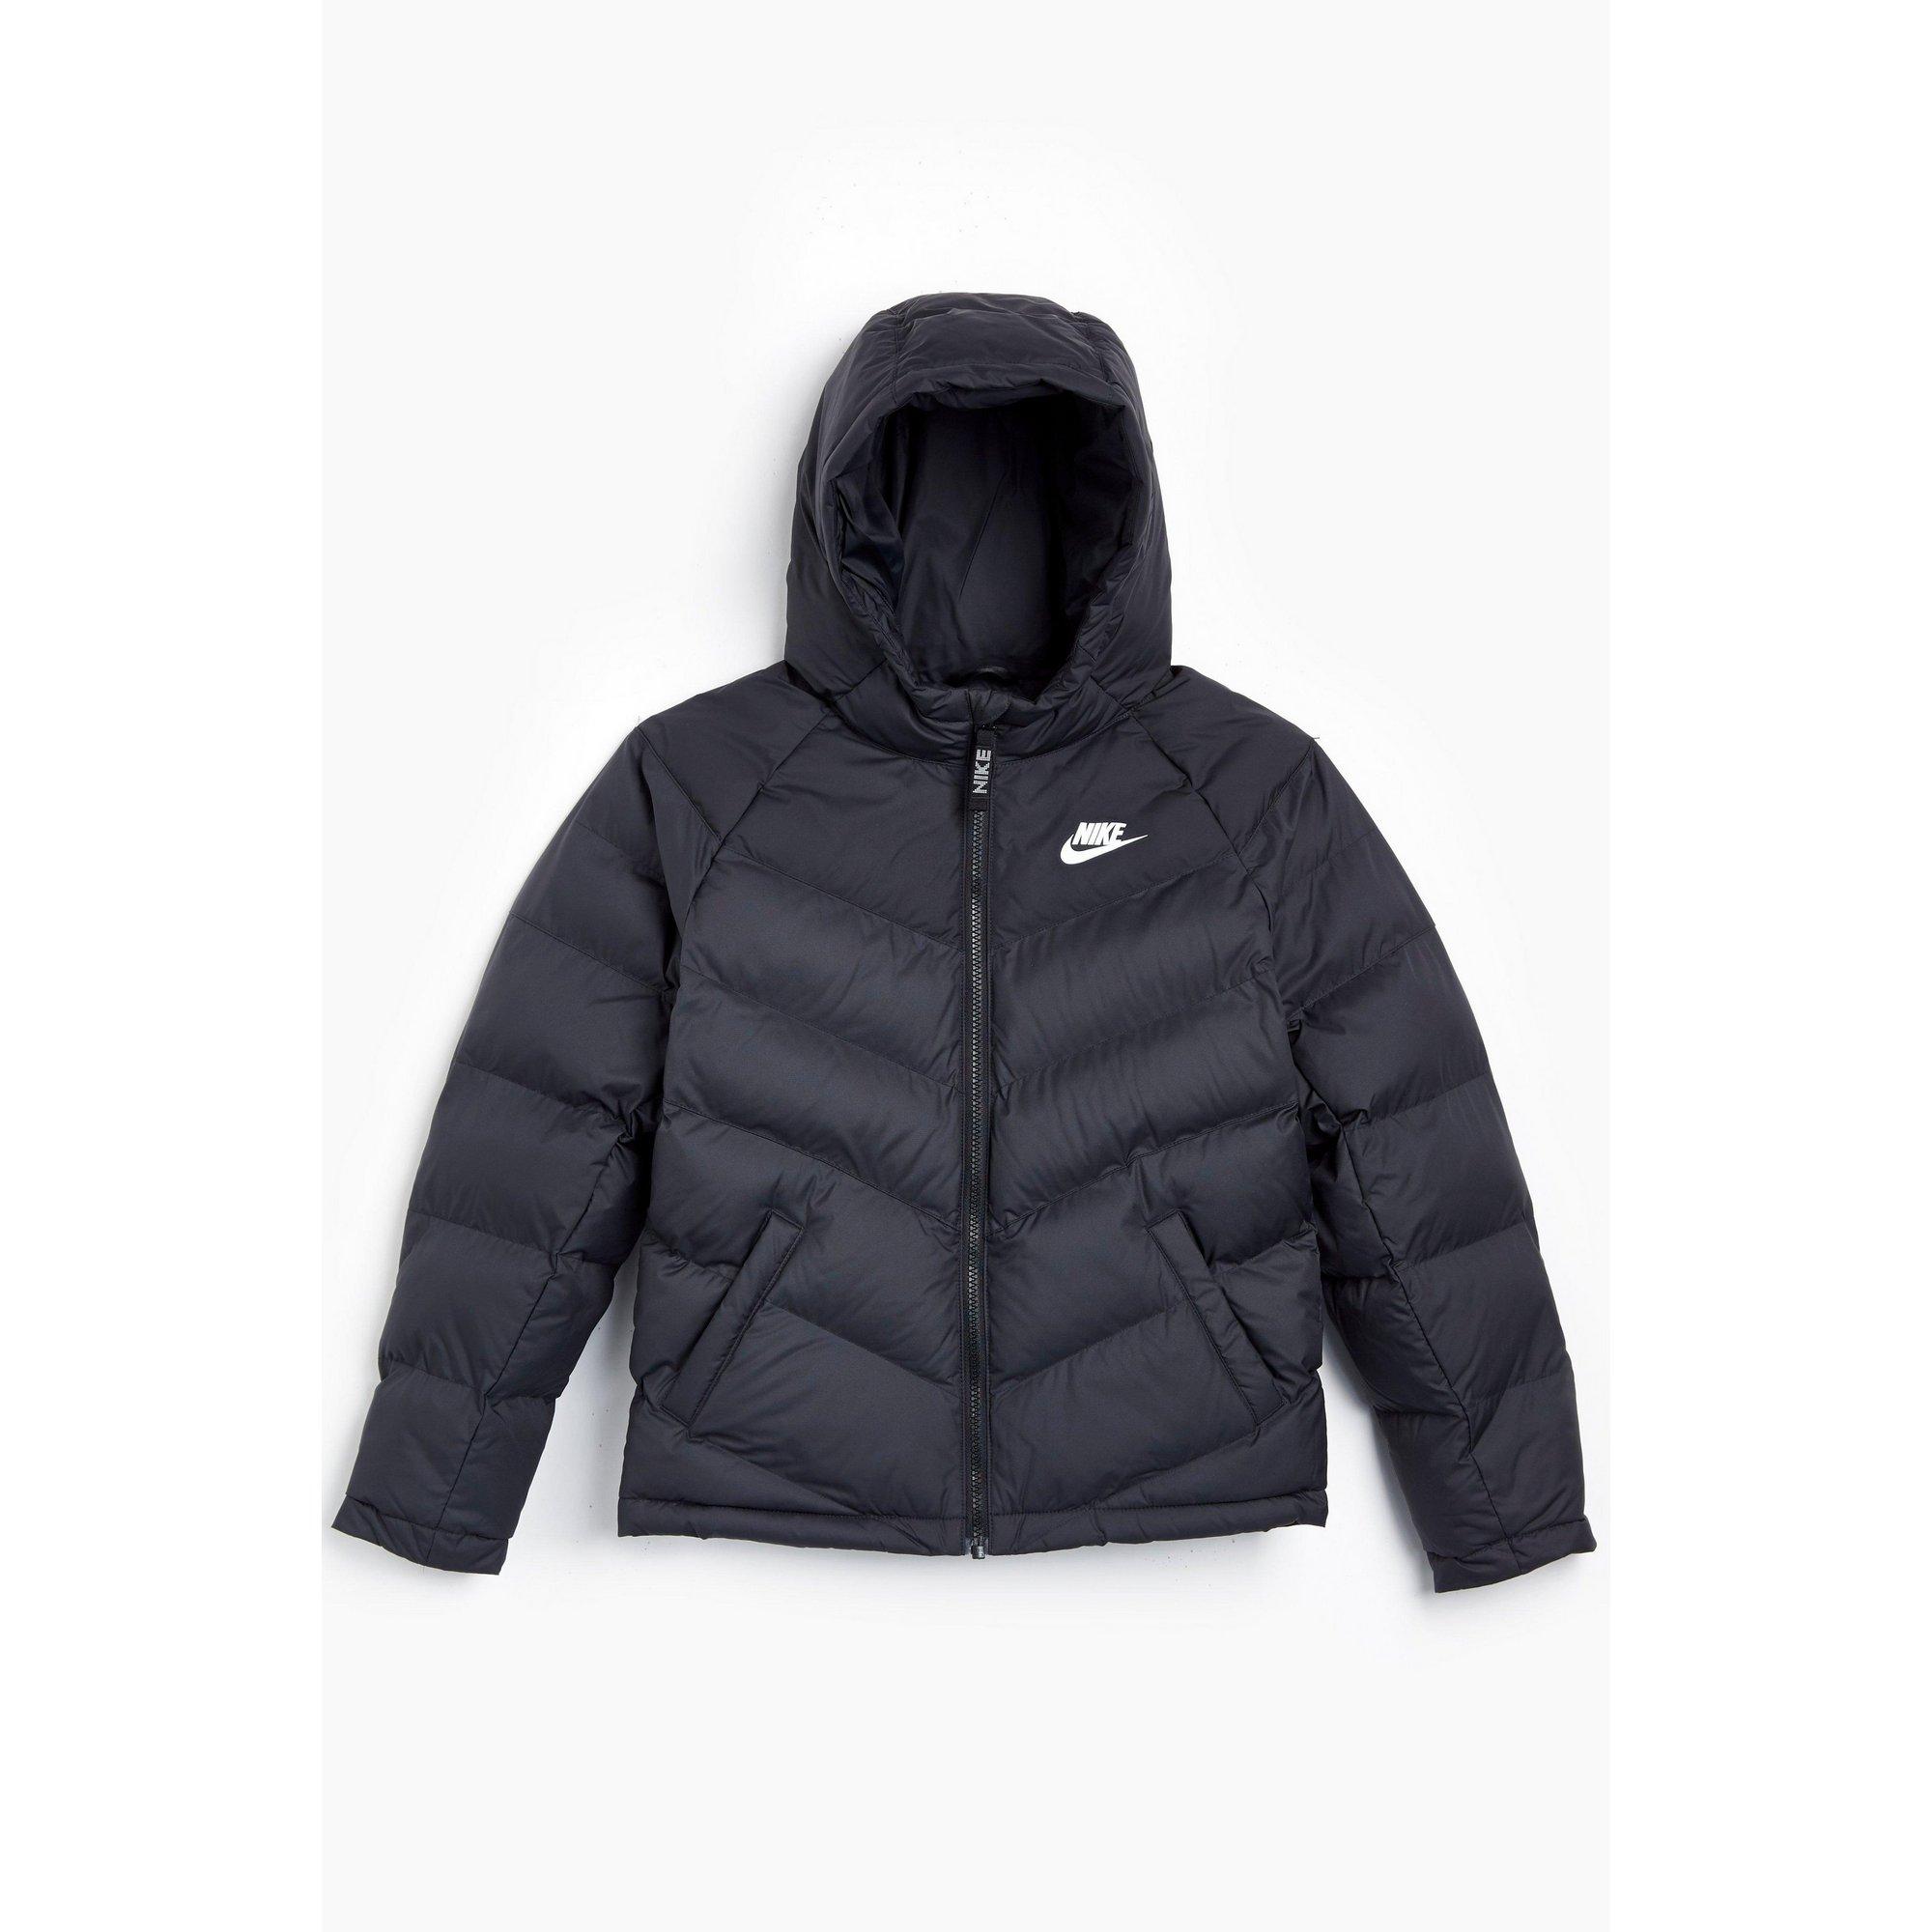 Image of Boys Nike NSW Synthetic Fill Black Jacket